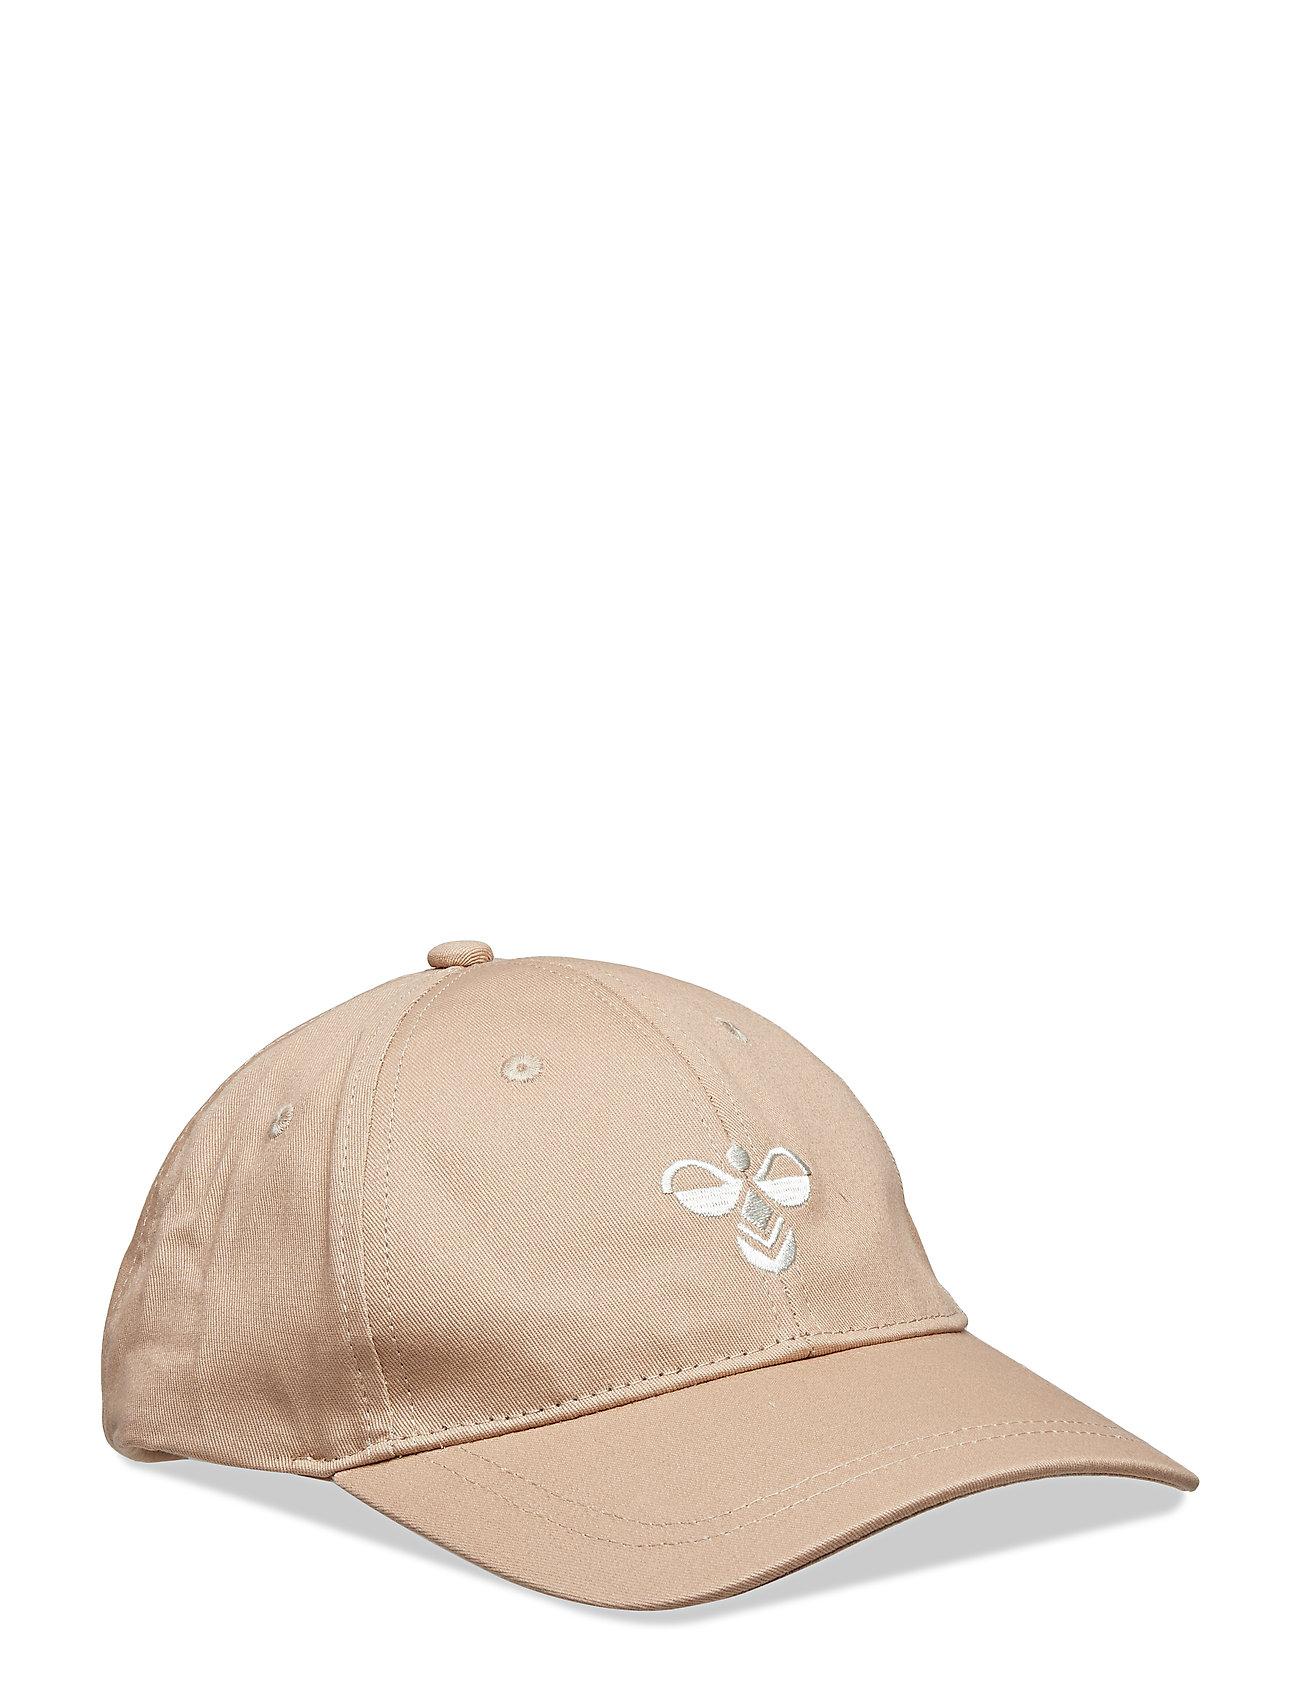 Hummel HMLRUBY CAP - NOMAD